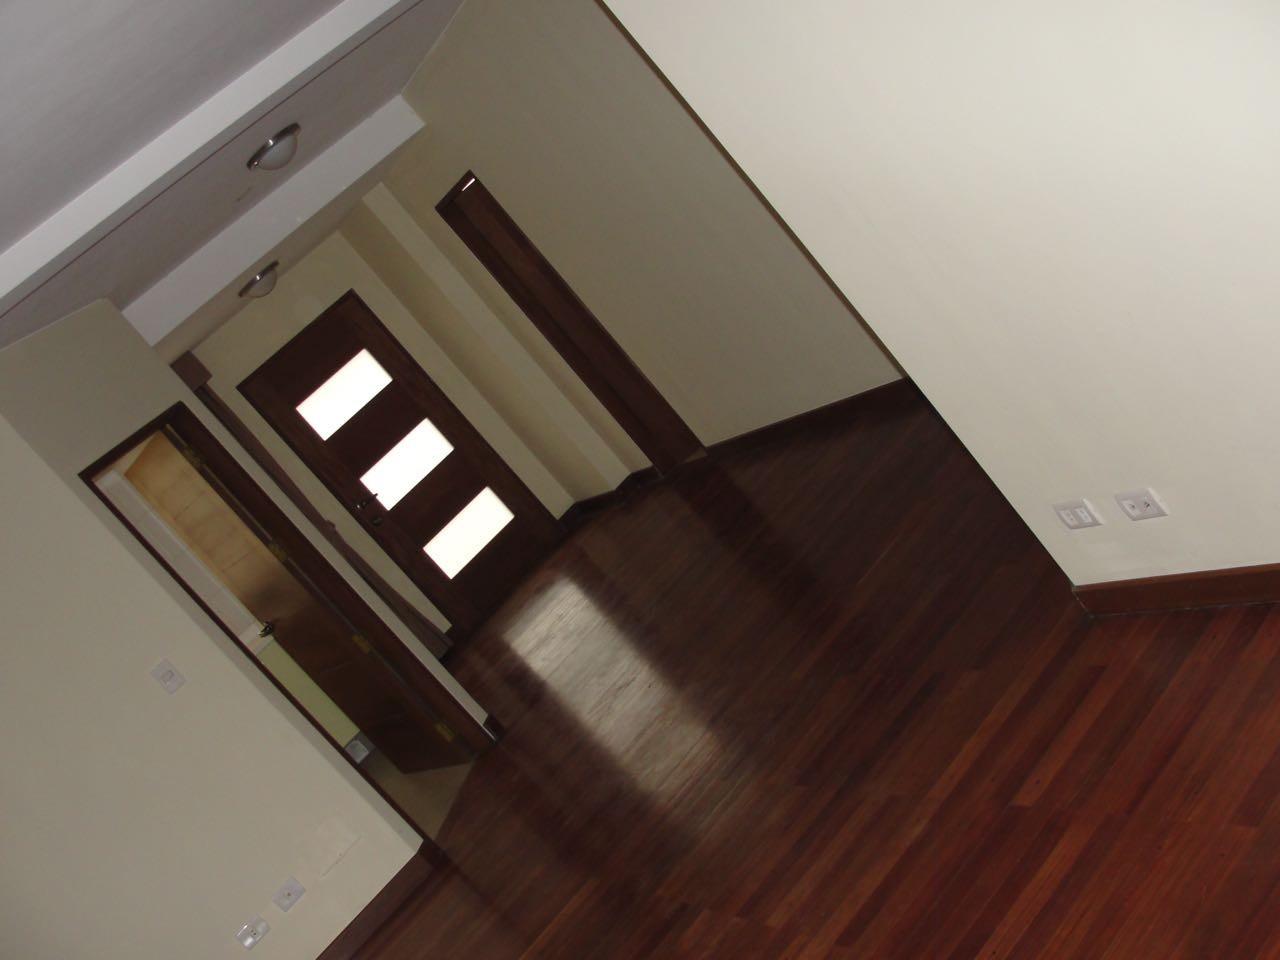 Departamento en Alquiler COTA COTA, BONITO DEPARTAMENTO EN ALQUILER Foto 7